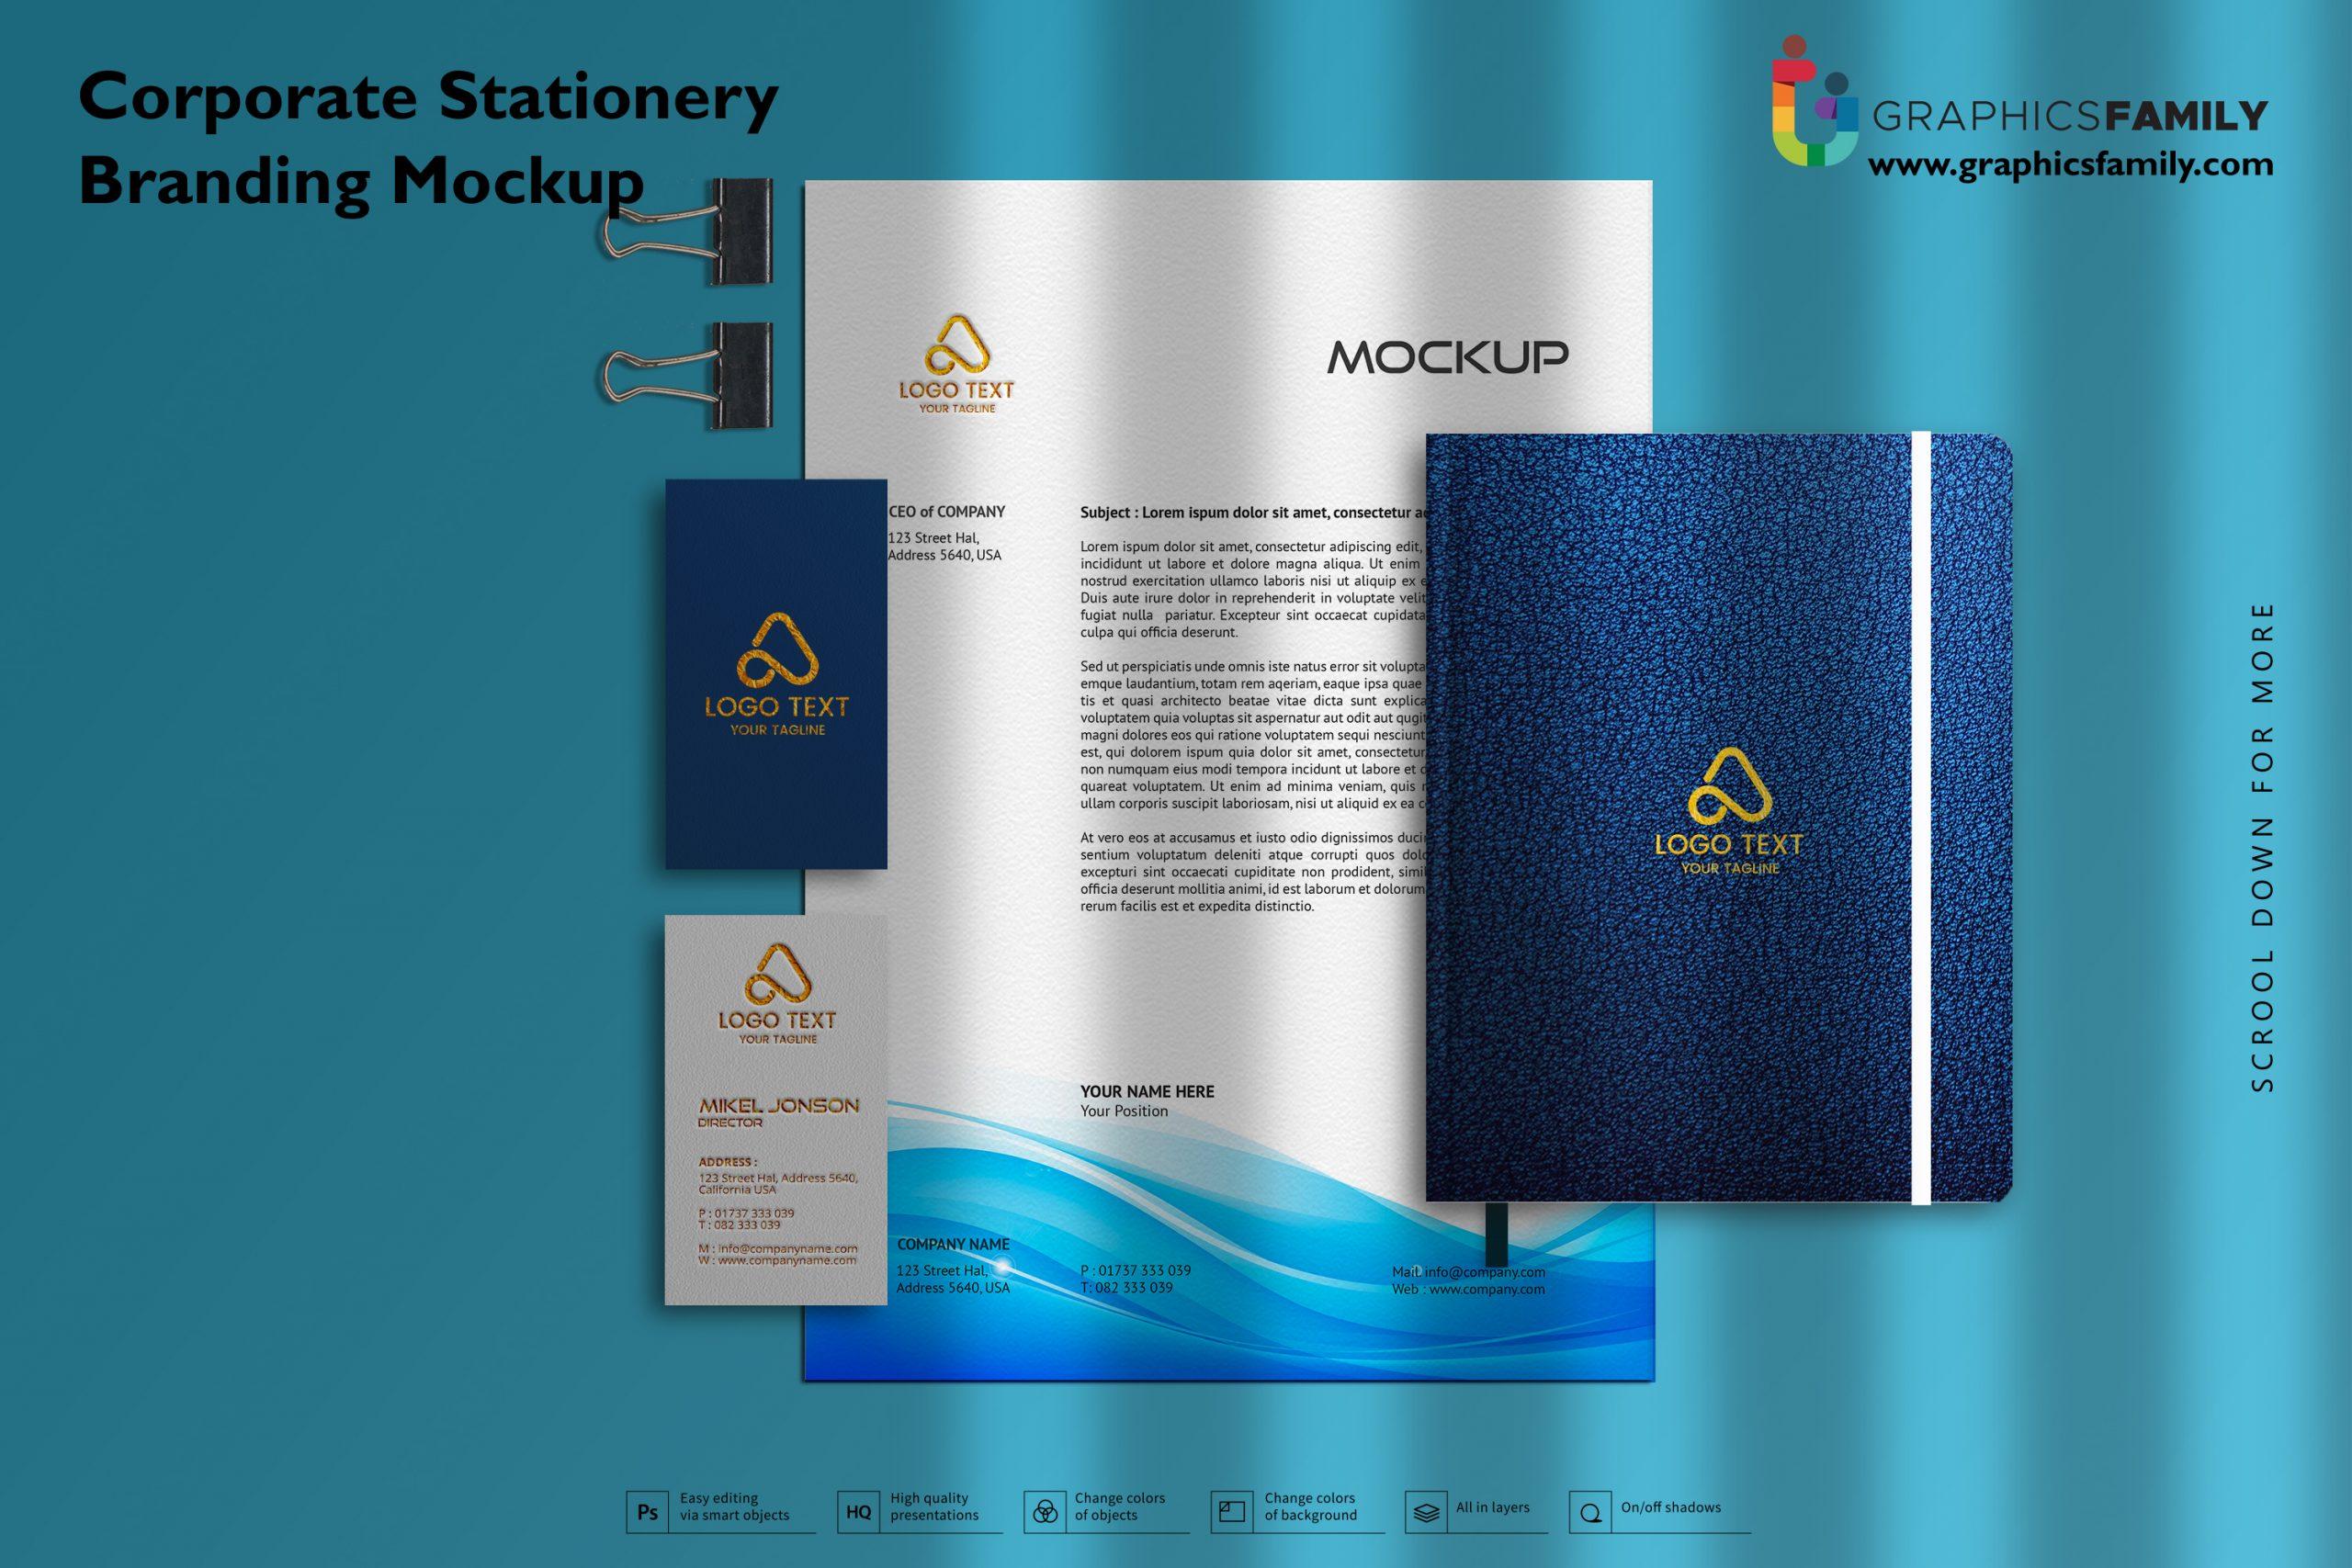 Corporate Stationery Branding Mockup FREE PSD